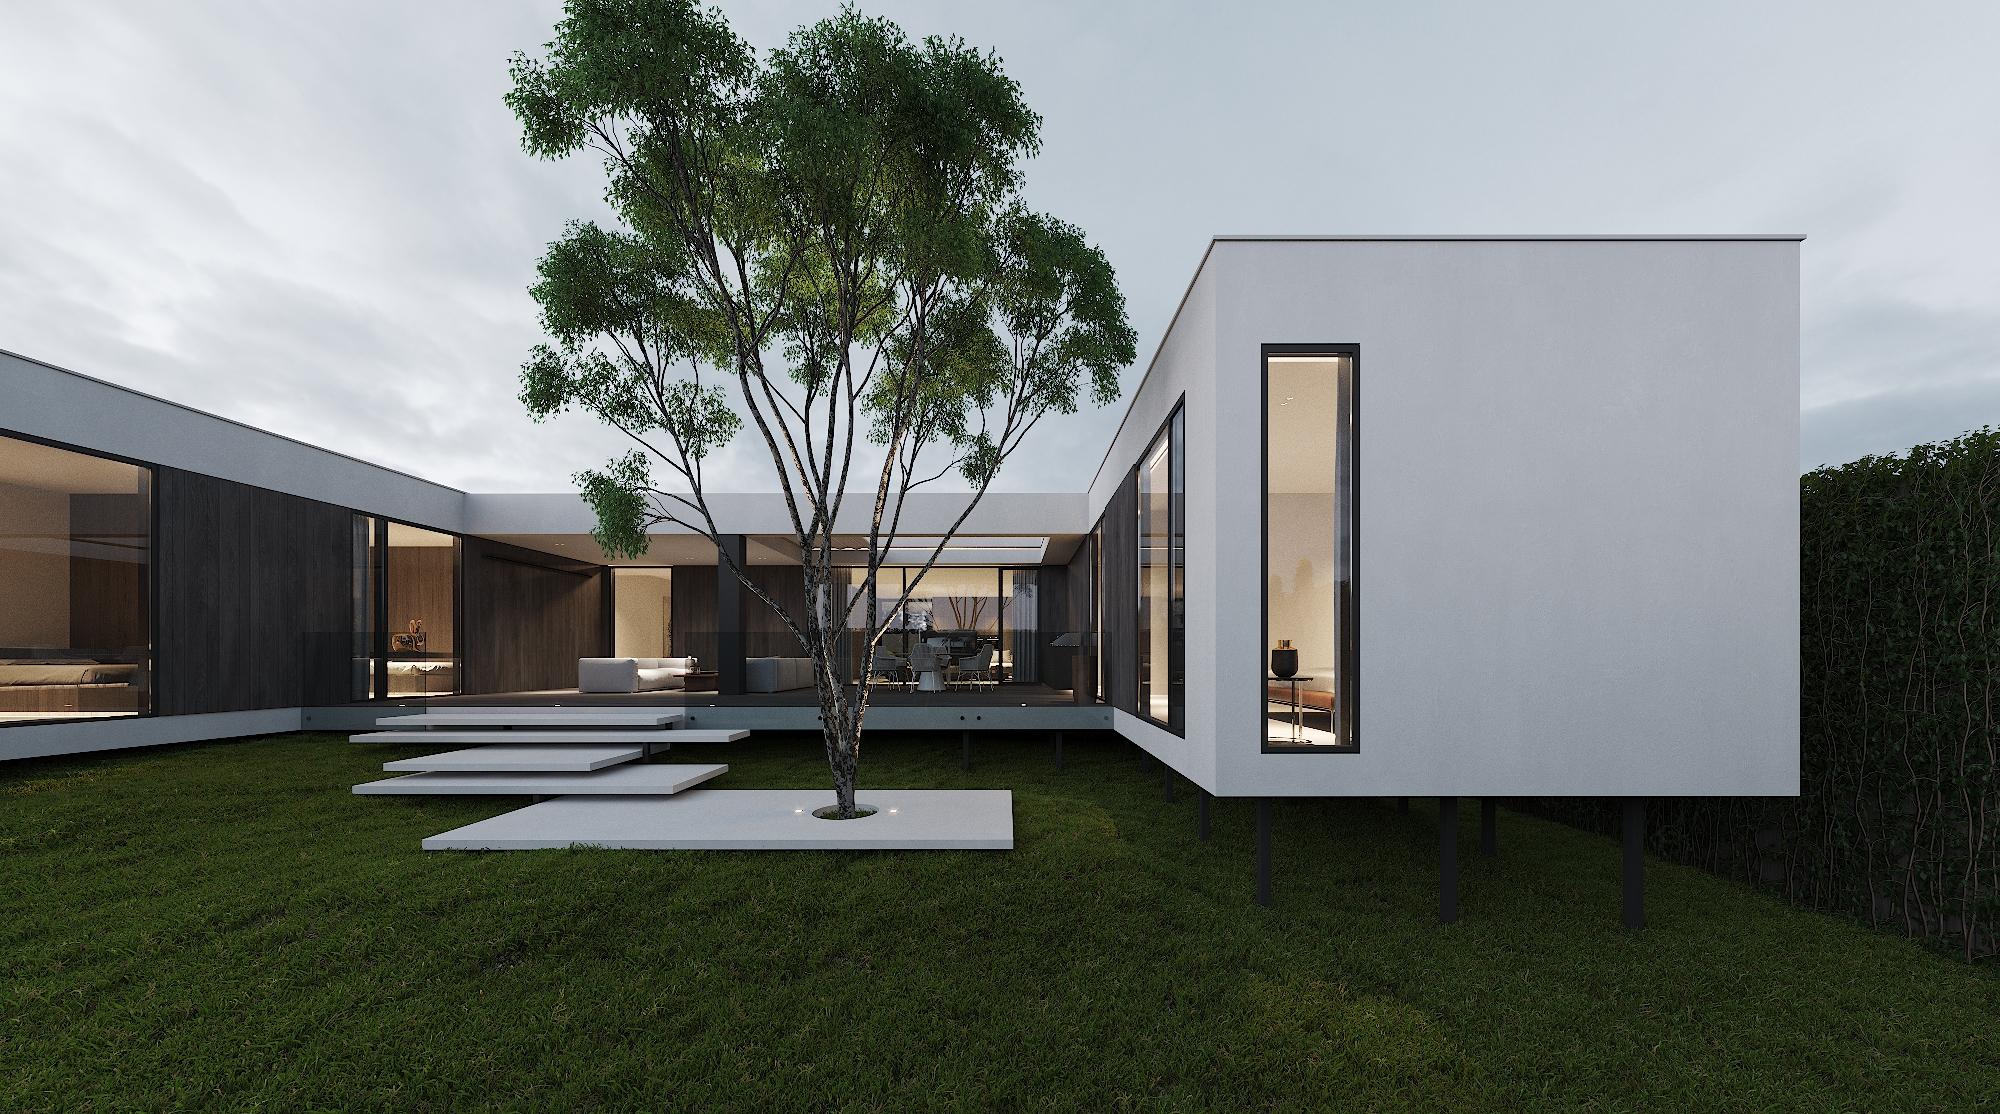 модульний будинок 240 кв.м., модульный дом 240 кв.м., module house 240 sqm.